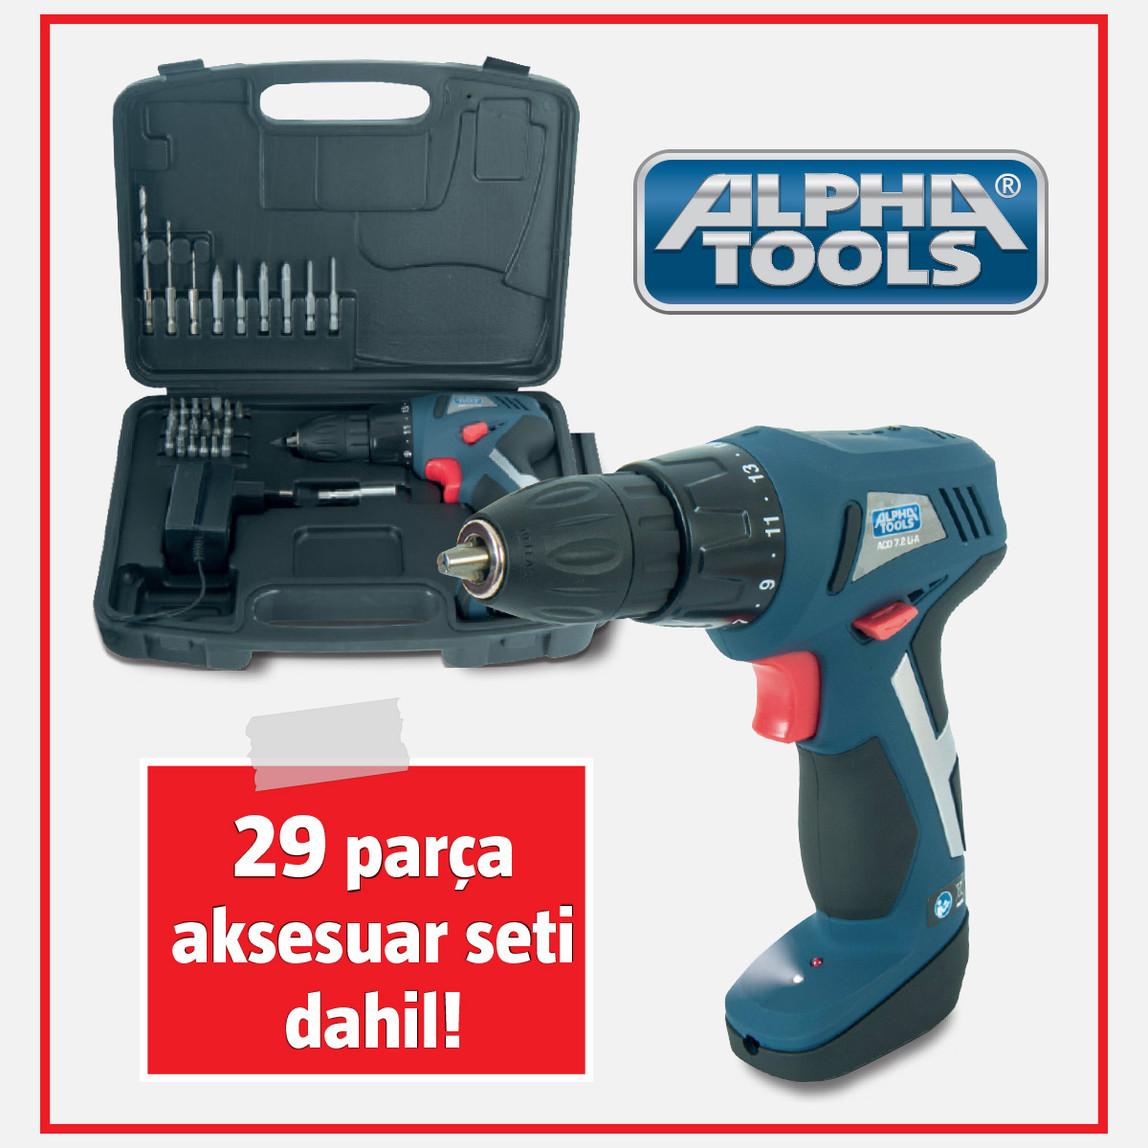 Alpha Tools Acd 7,2Li Şarjlı Vidalama